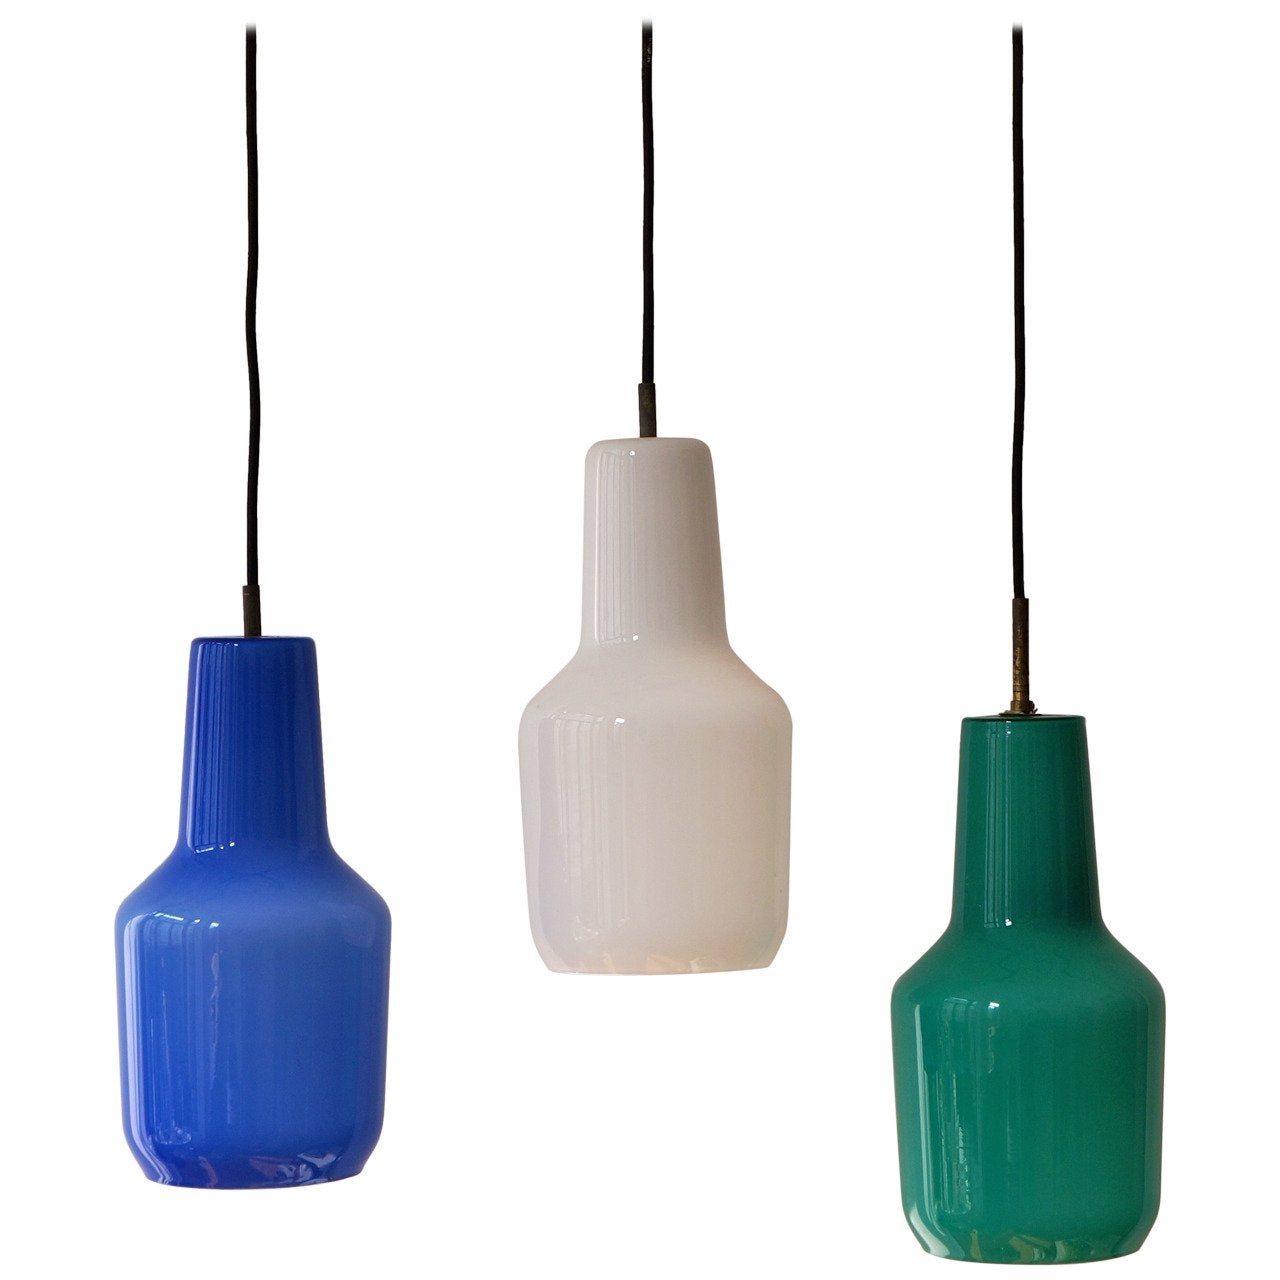 Four Venini Massimo Vignelli Pendant Lamps, 1960